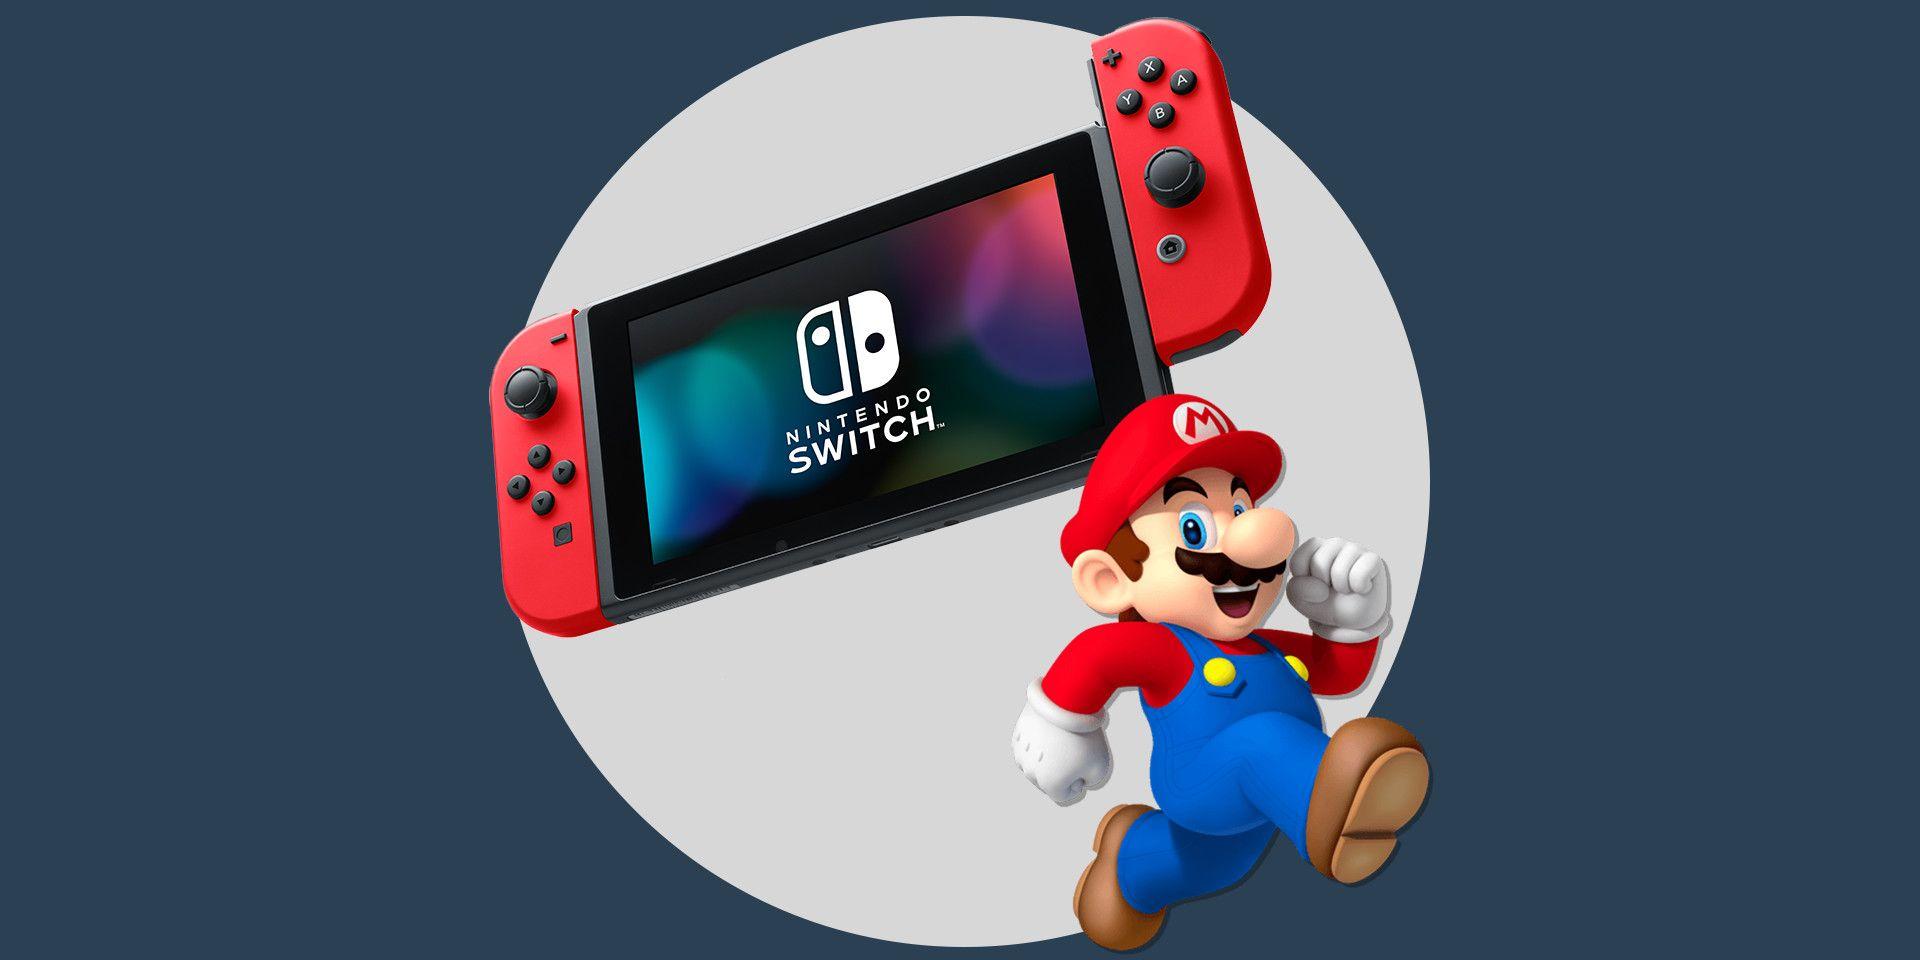 Shop Nintendo Switch Bundle Sale With Red Joy Con Eshop Credit At Walmart